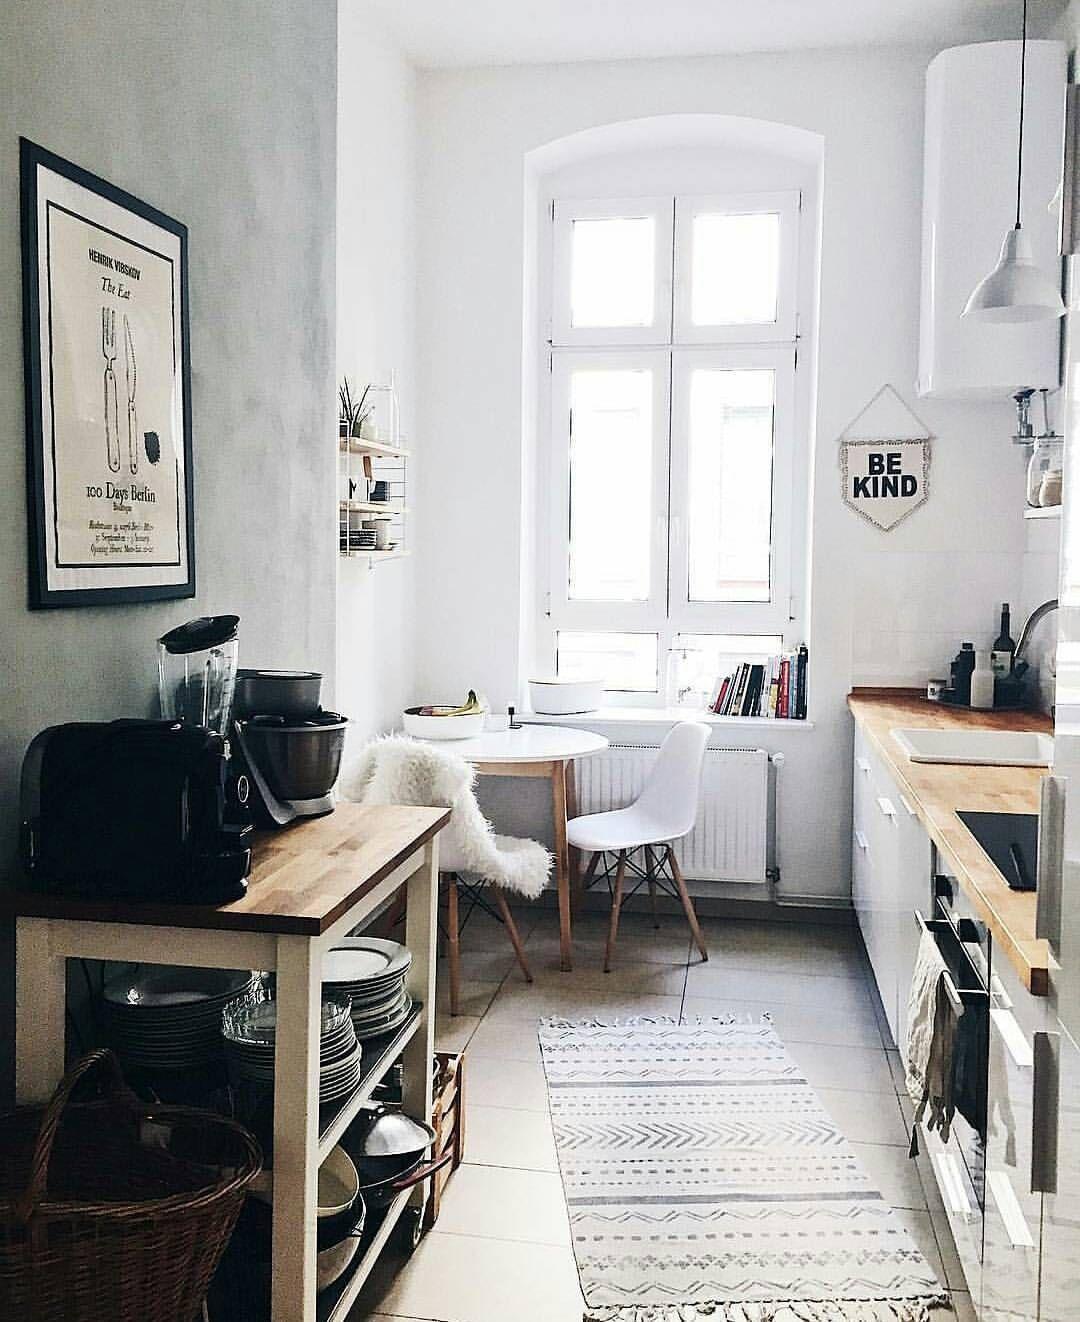 Home interior design farbkombinationen gefällt  mal  kommentare  connox interior design shop